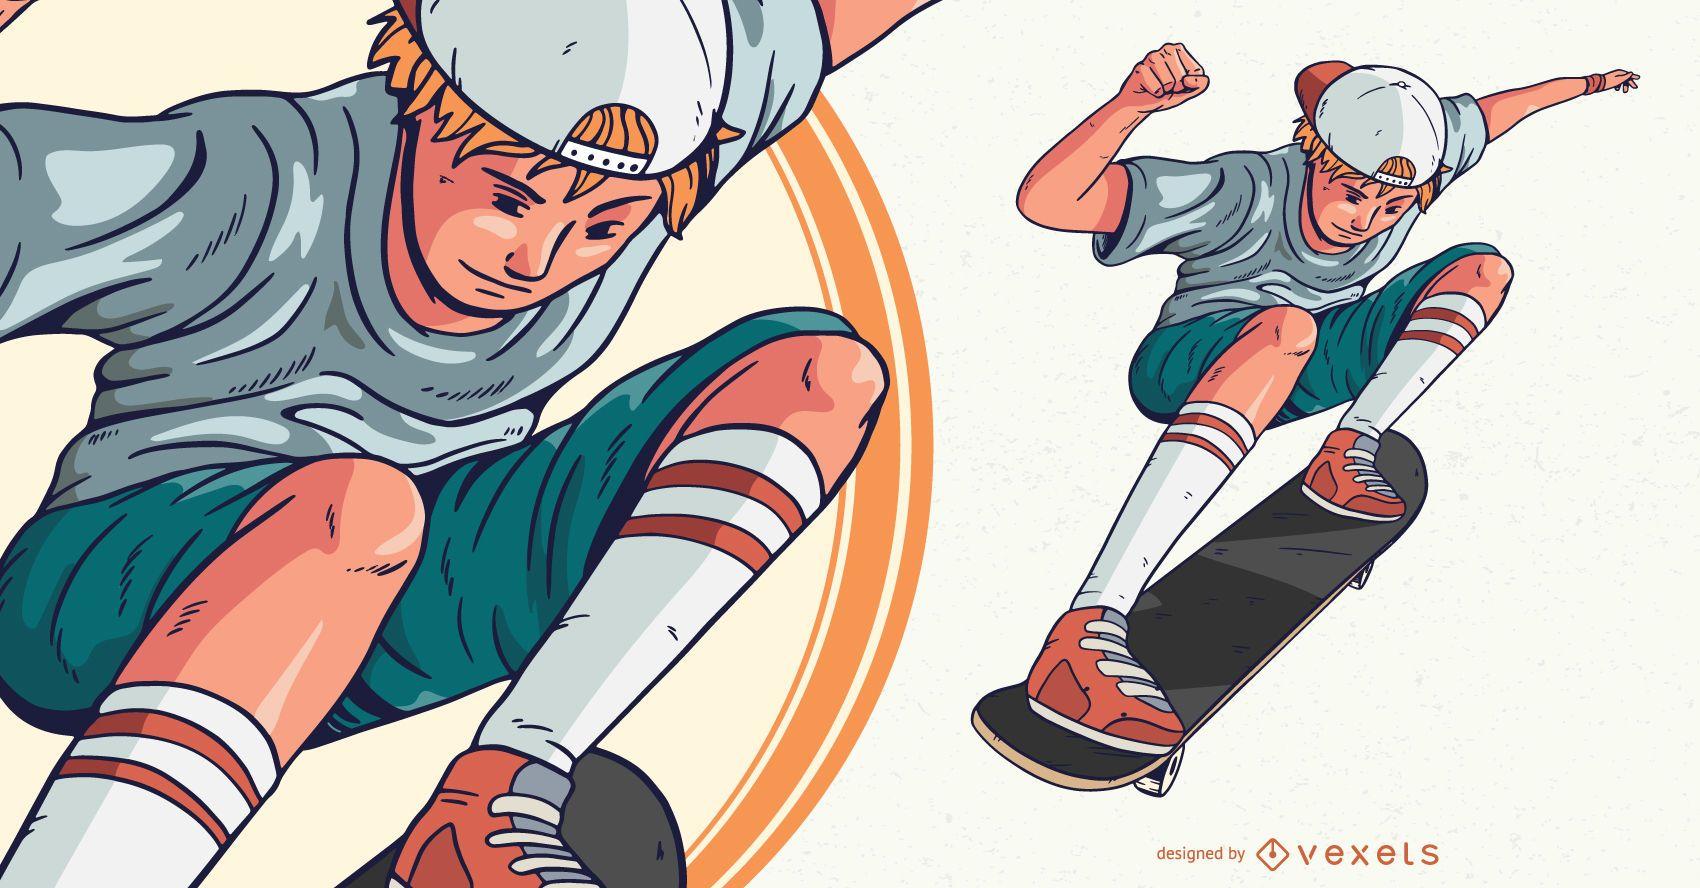 Boy skateboarding character illustration